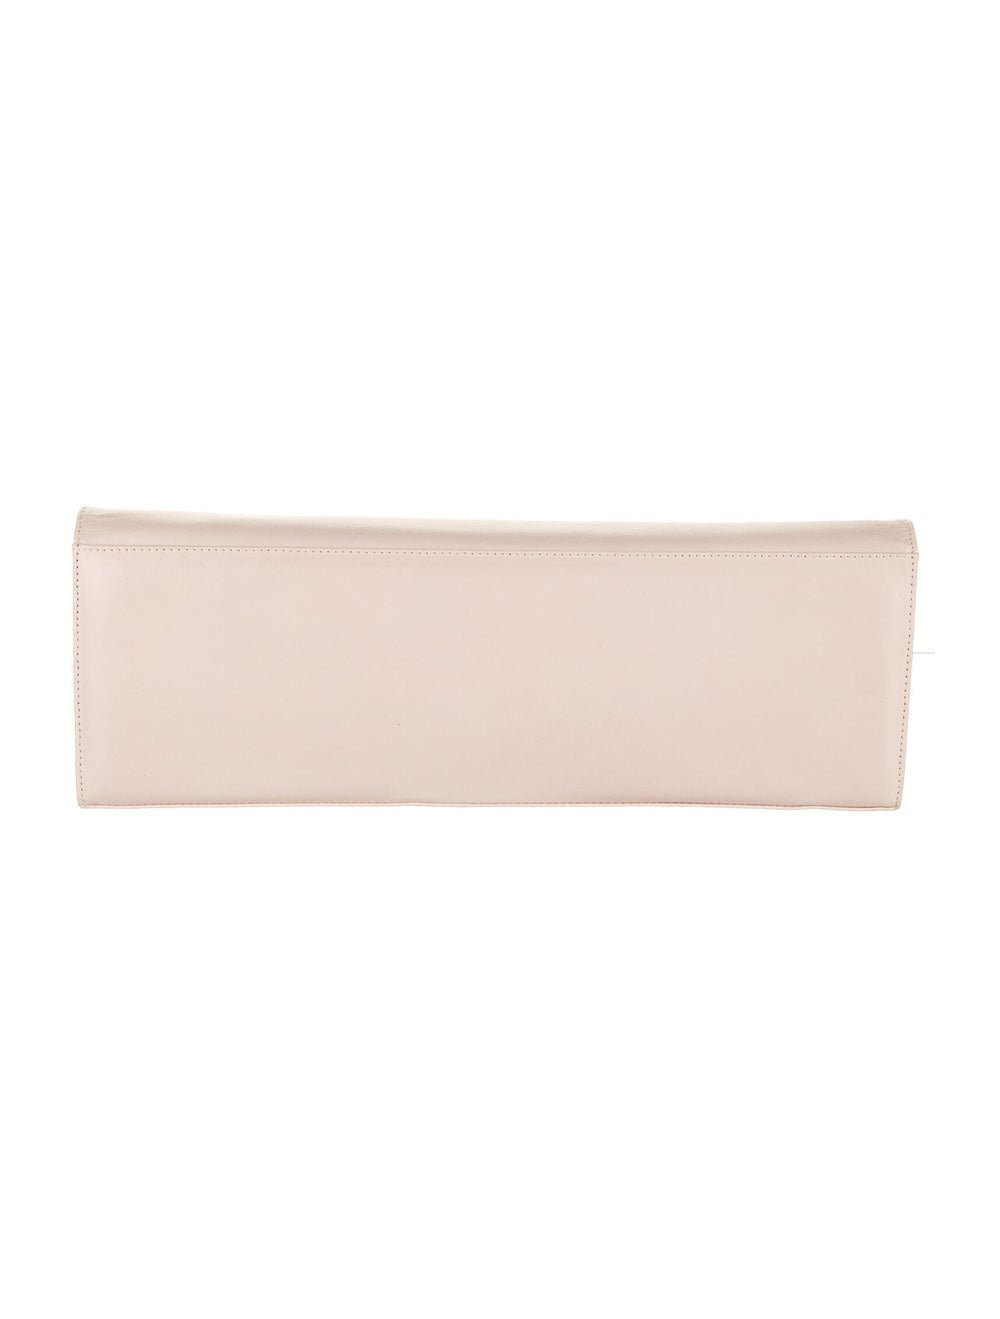 Stuart Weitzman Leather Flap Clutch Pink - image 4